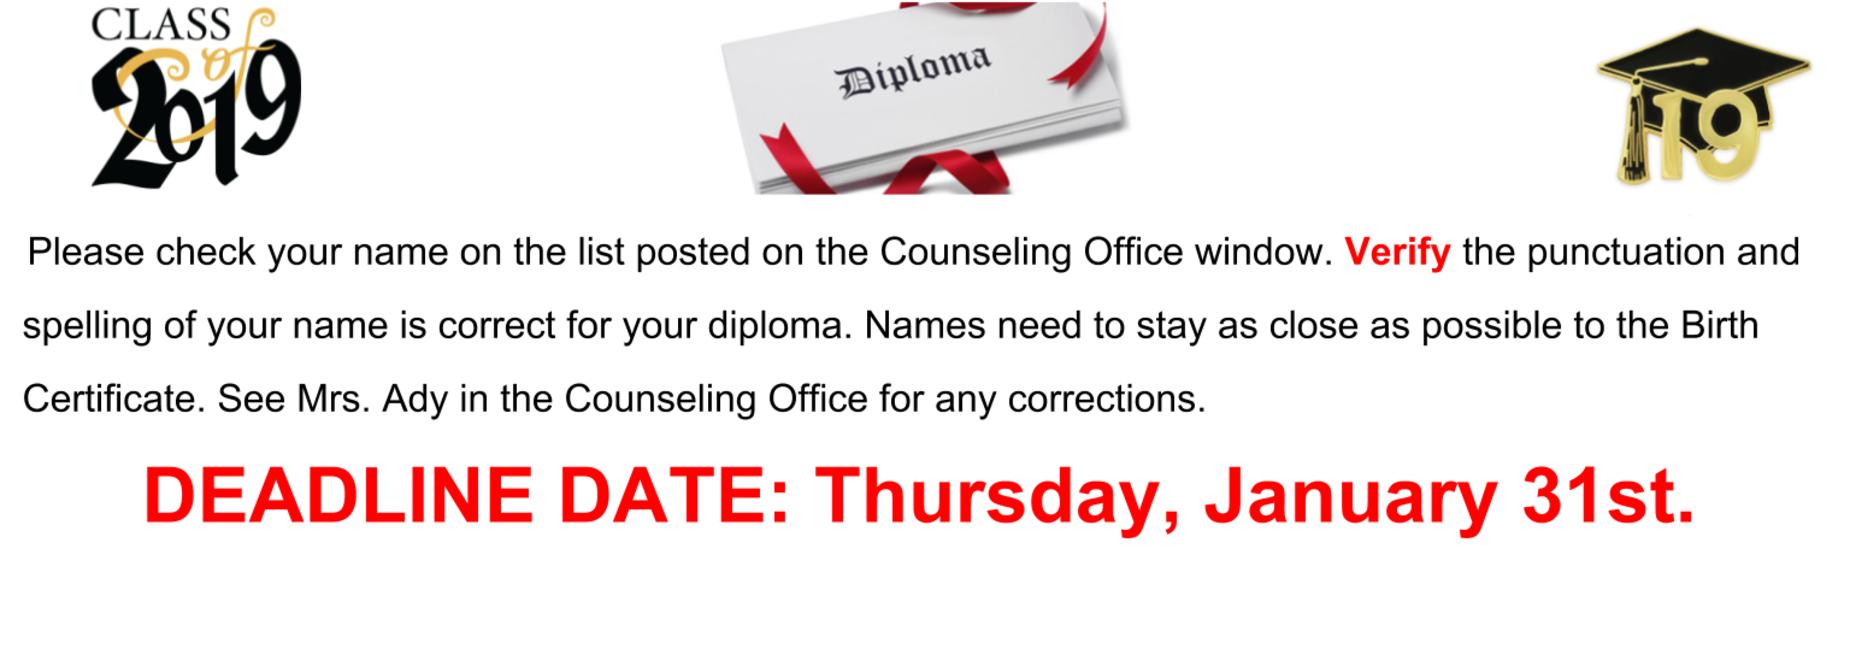 Verify Diploma information